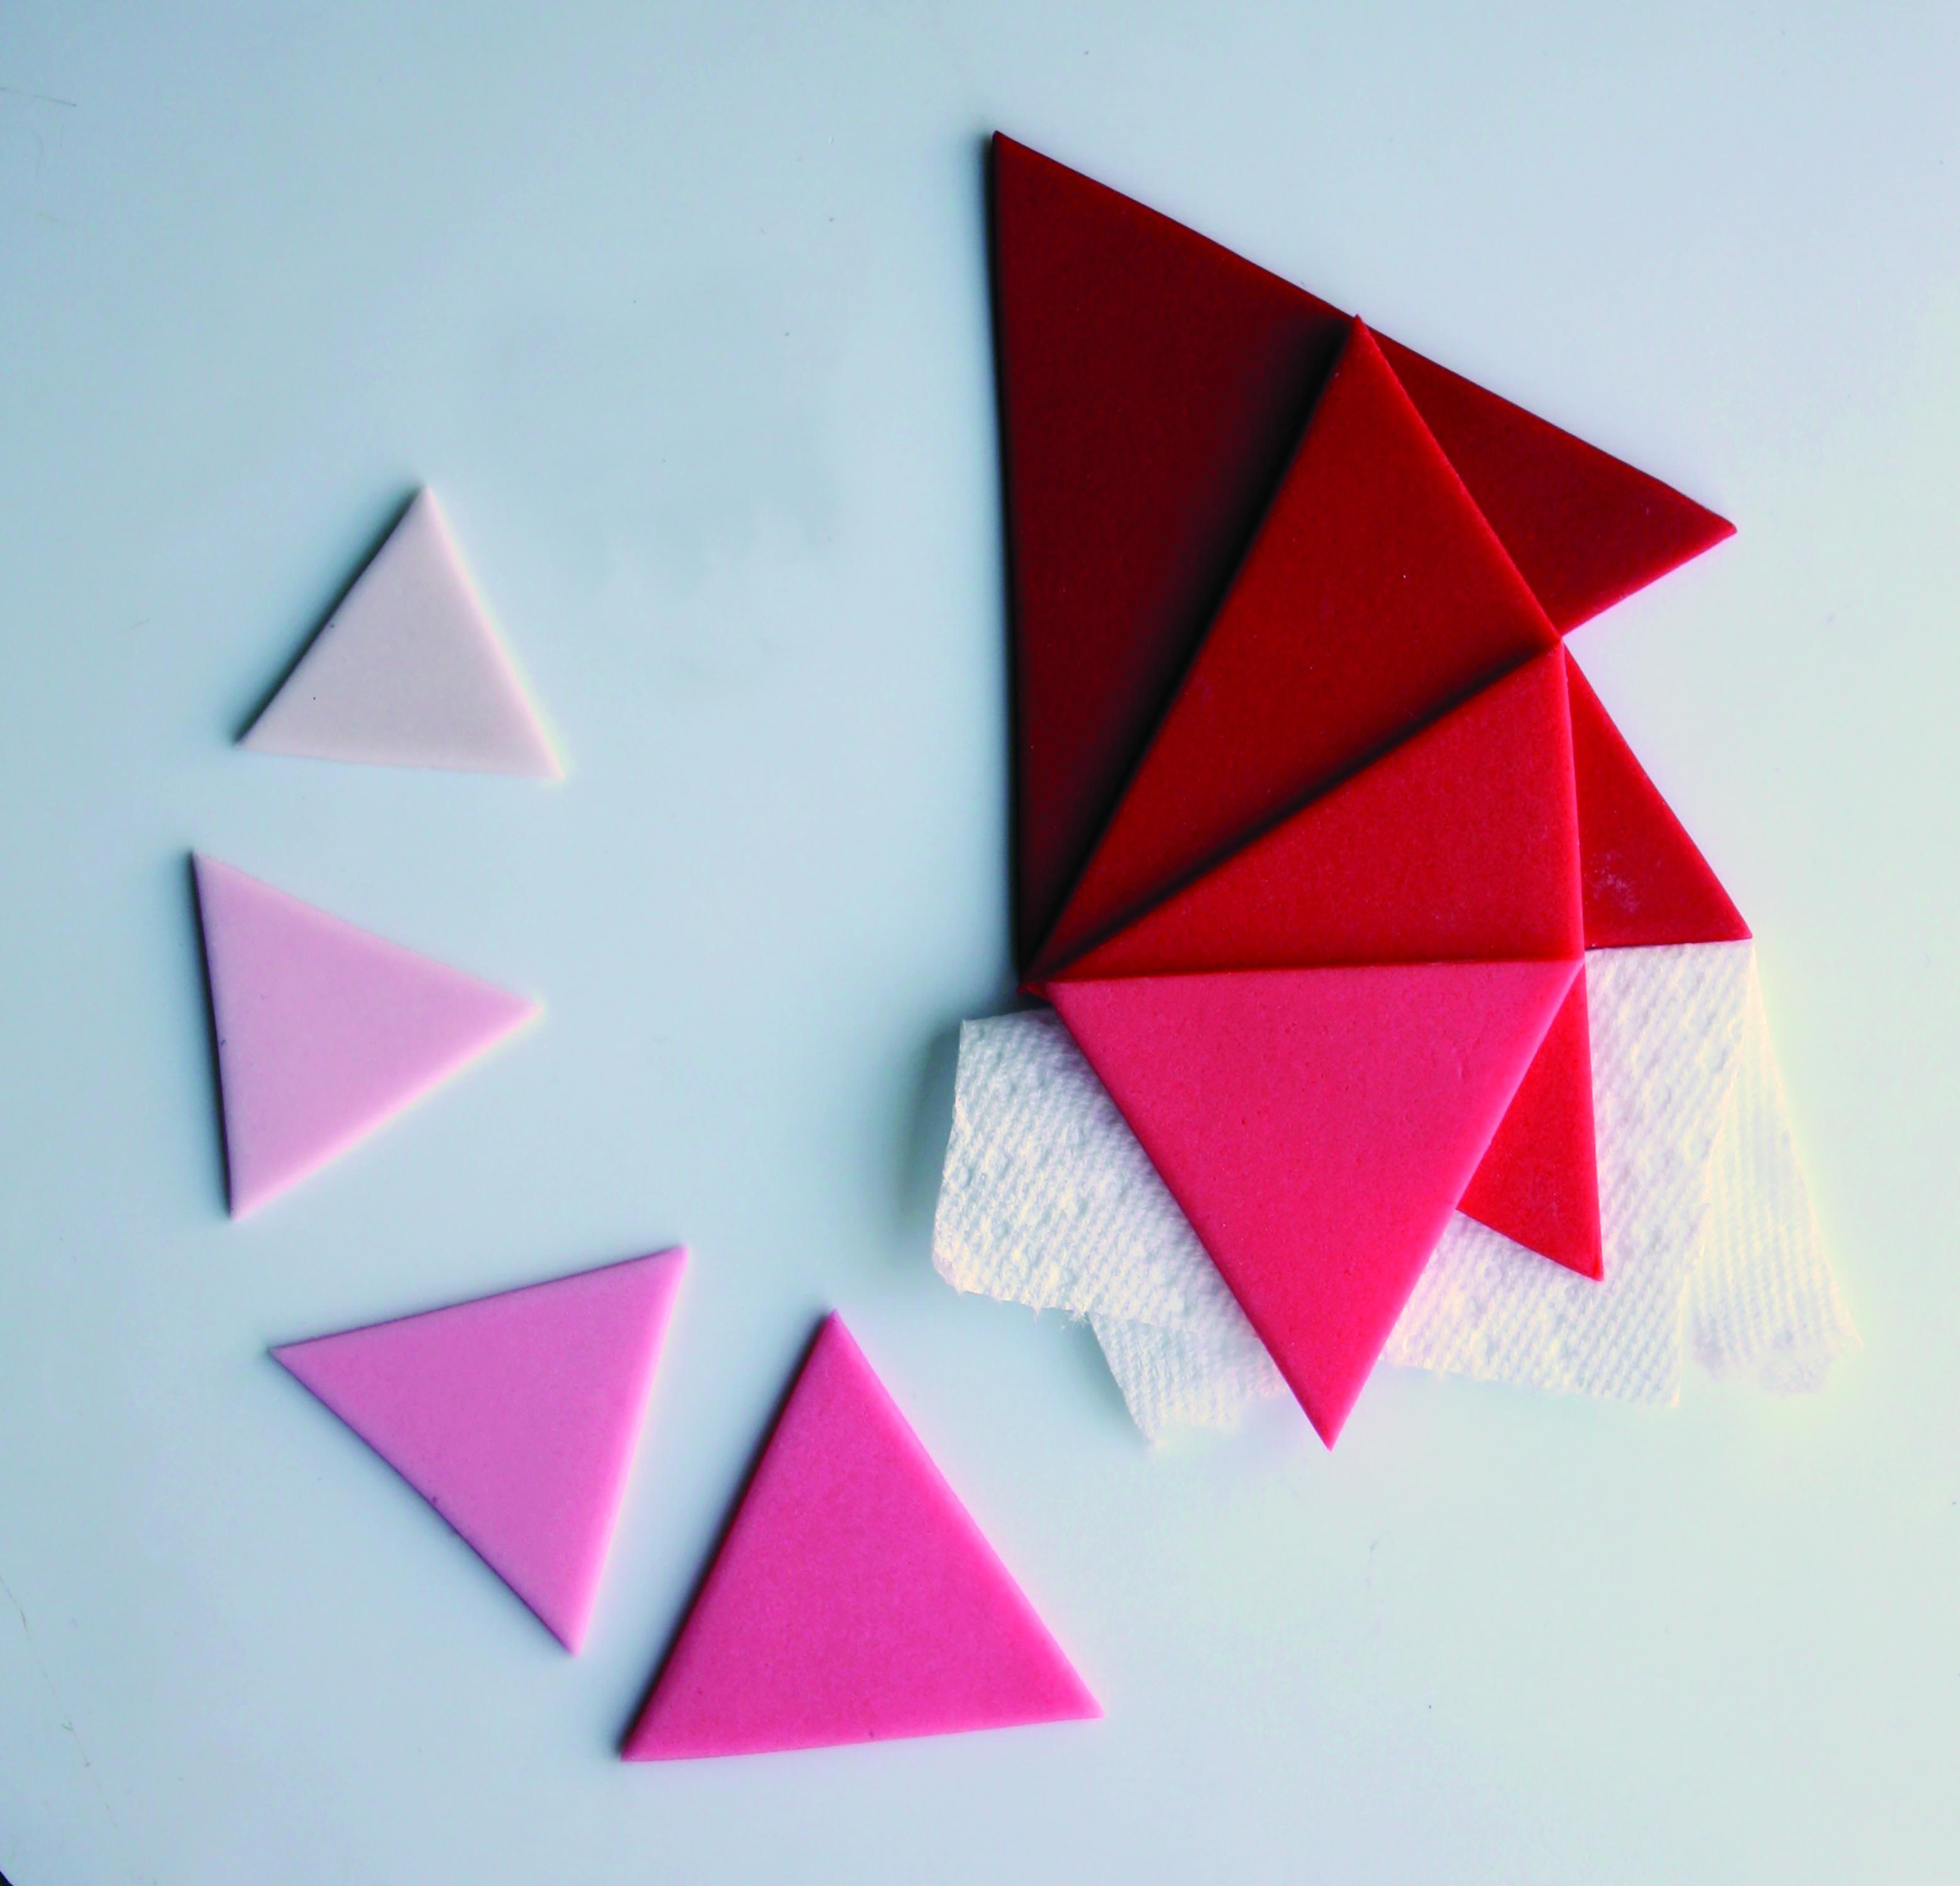 red-ombre-9.jpg#asset:16793